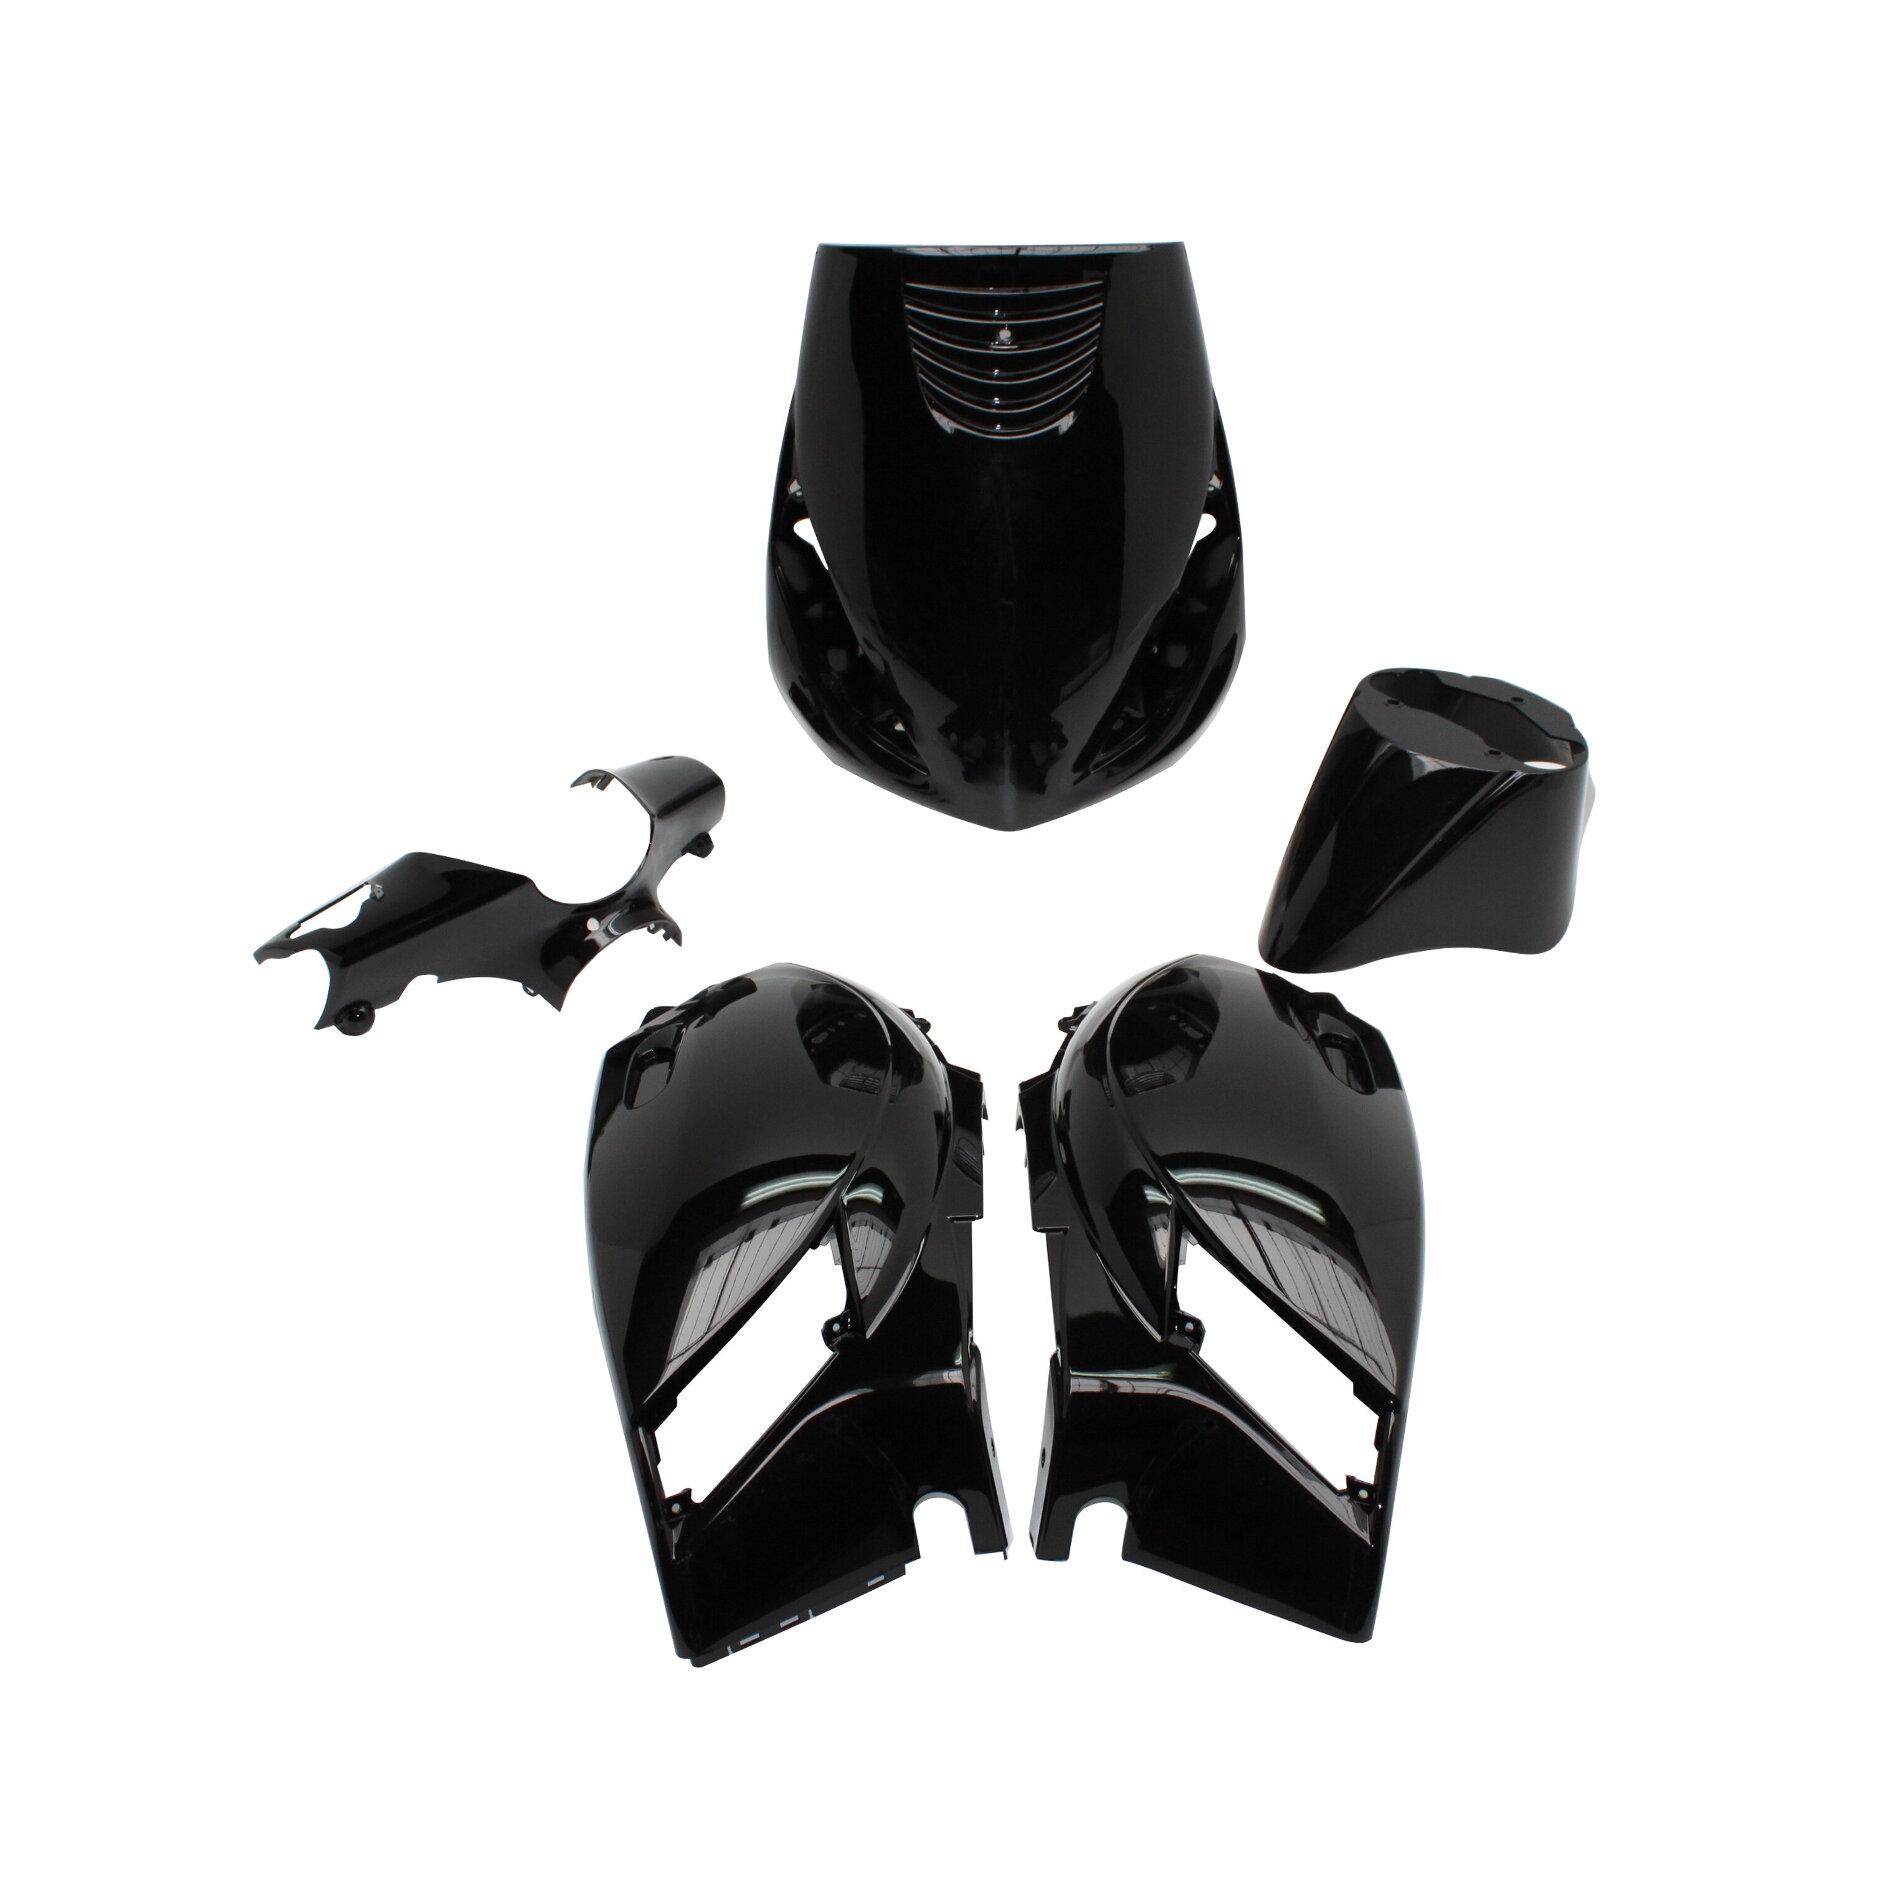 Kit habillage type origine Piaggio Zip 2000> - Noir